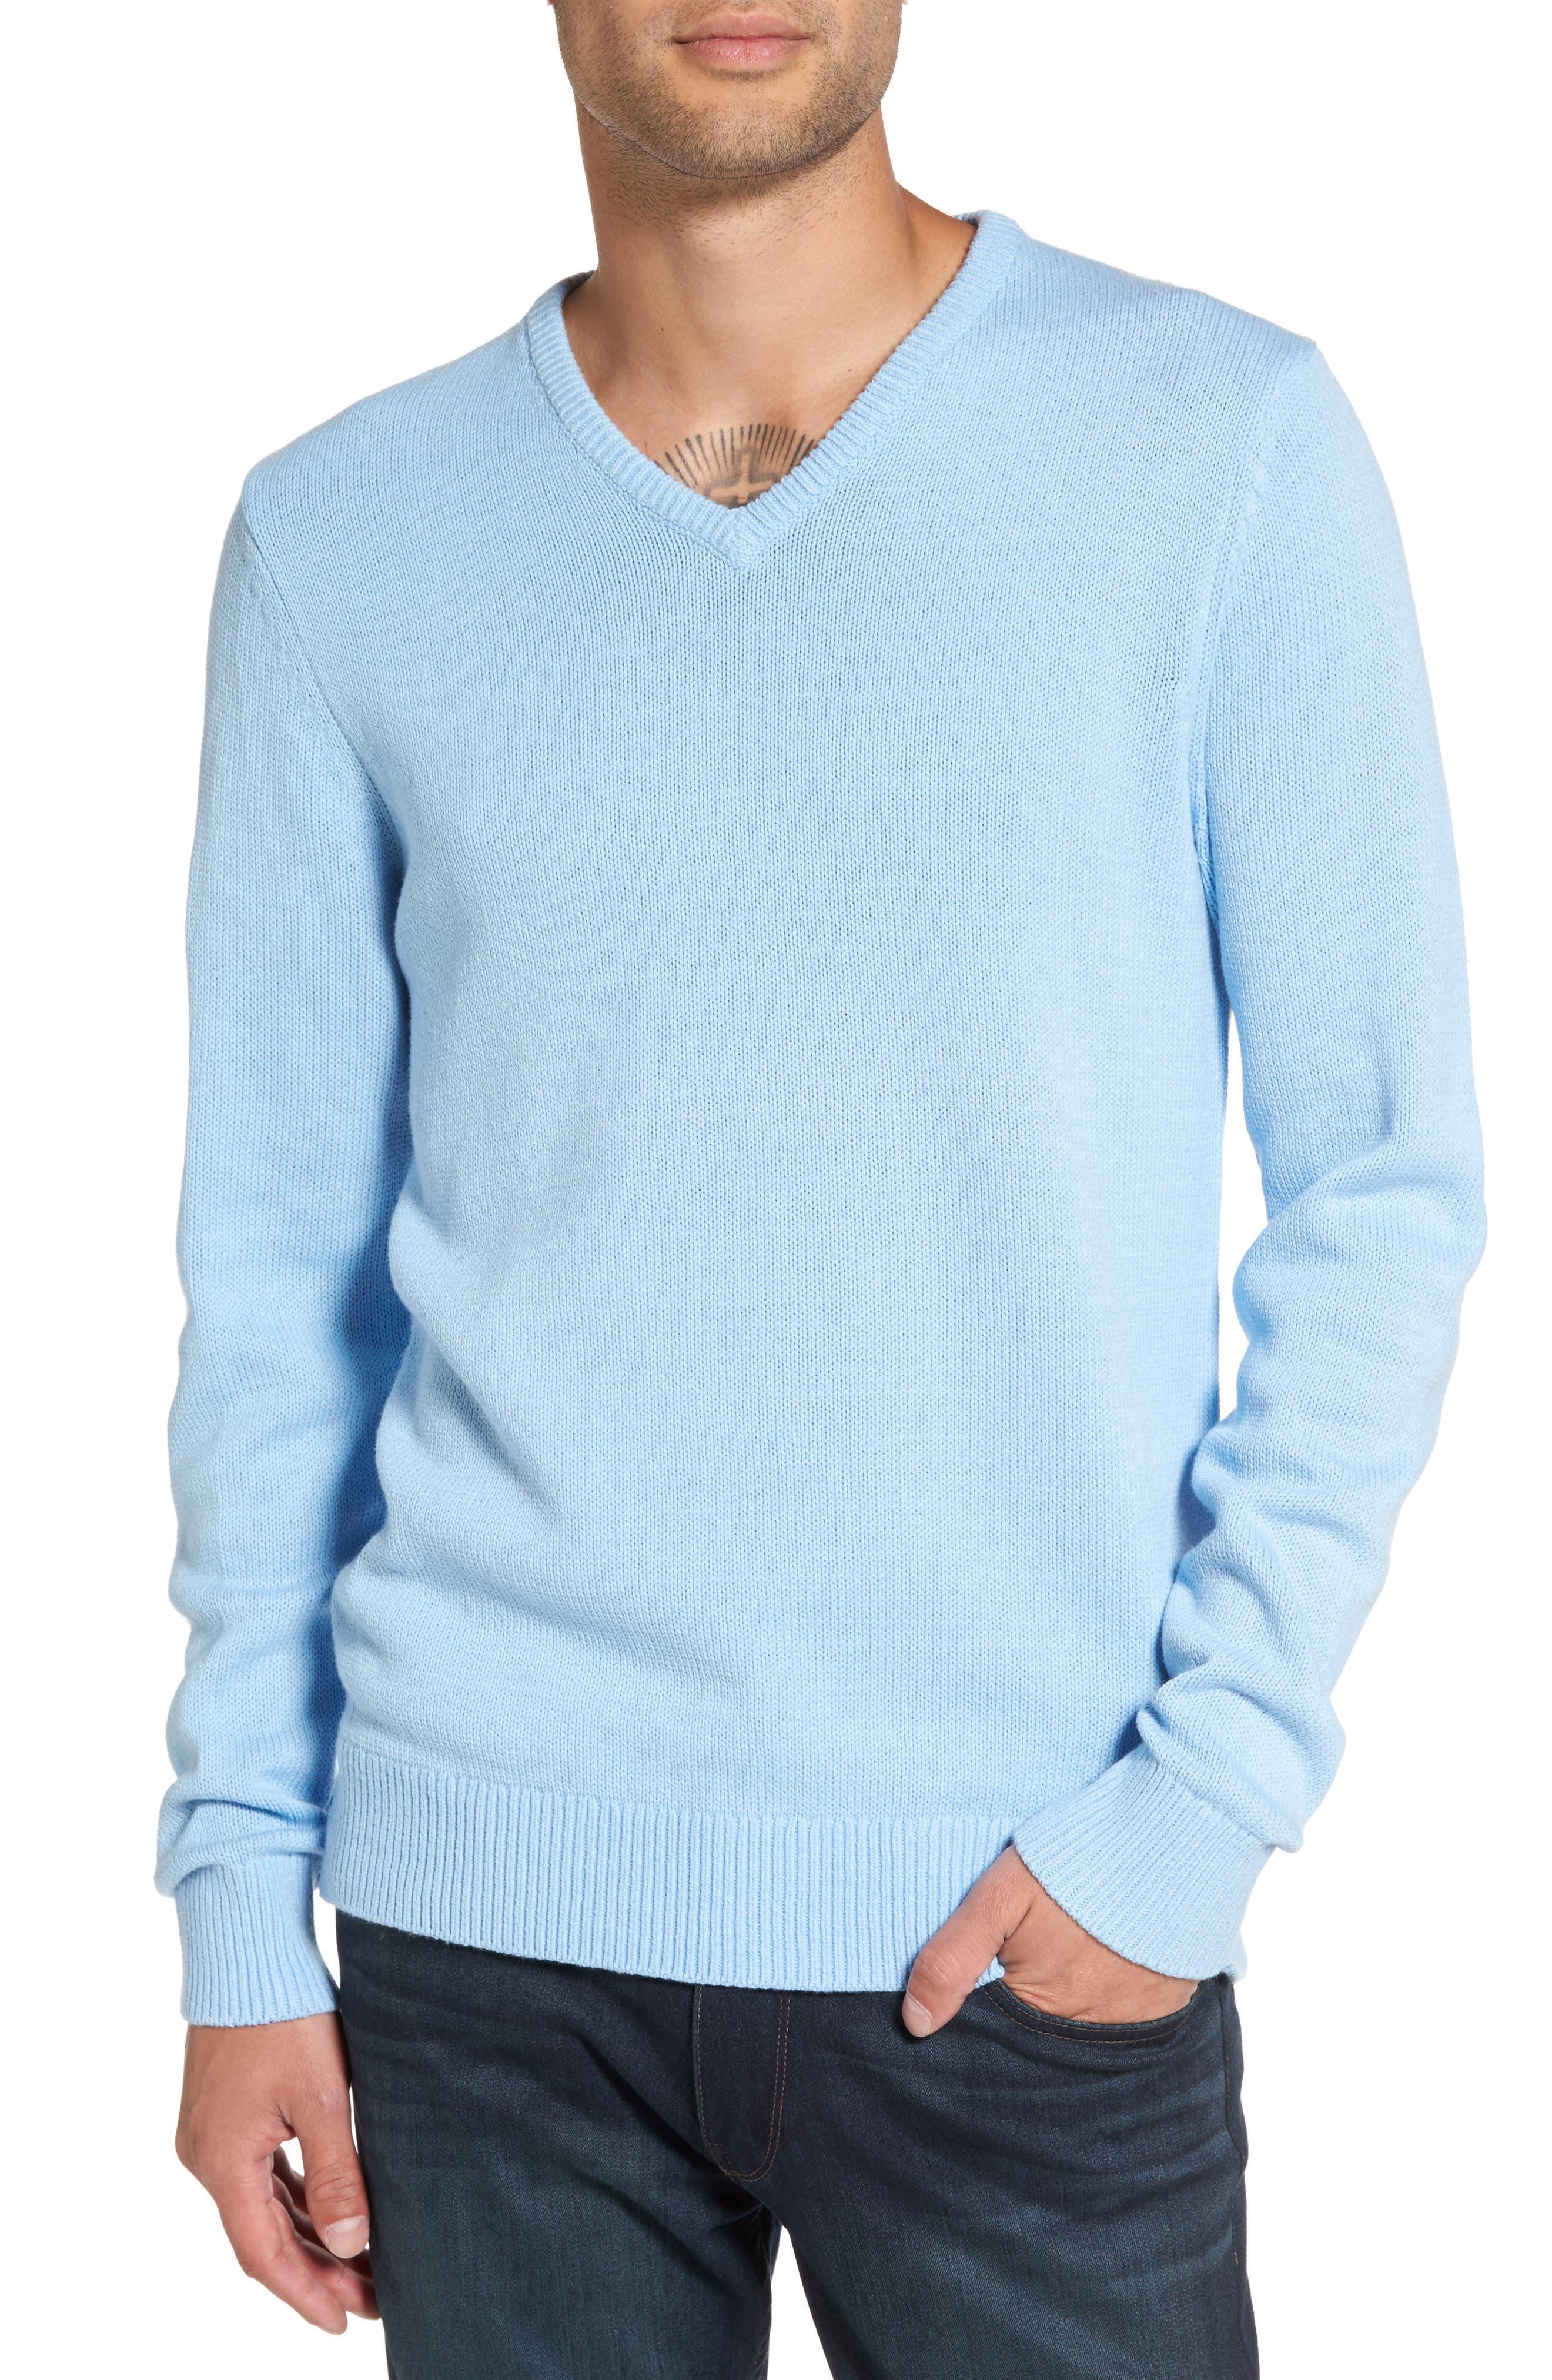 1901 V-Neck Cotton Blend Sweater